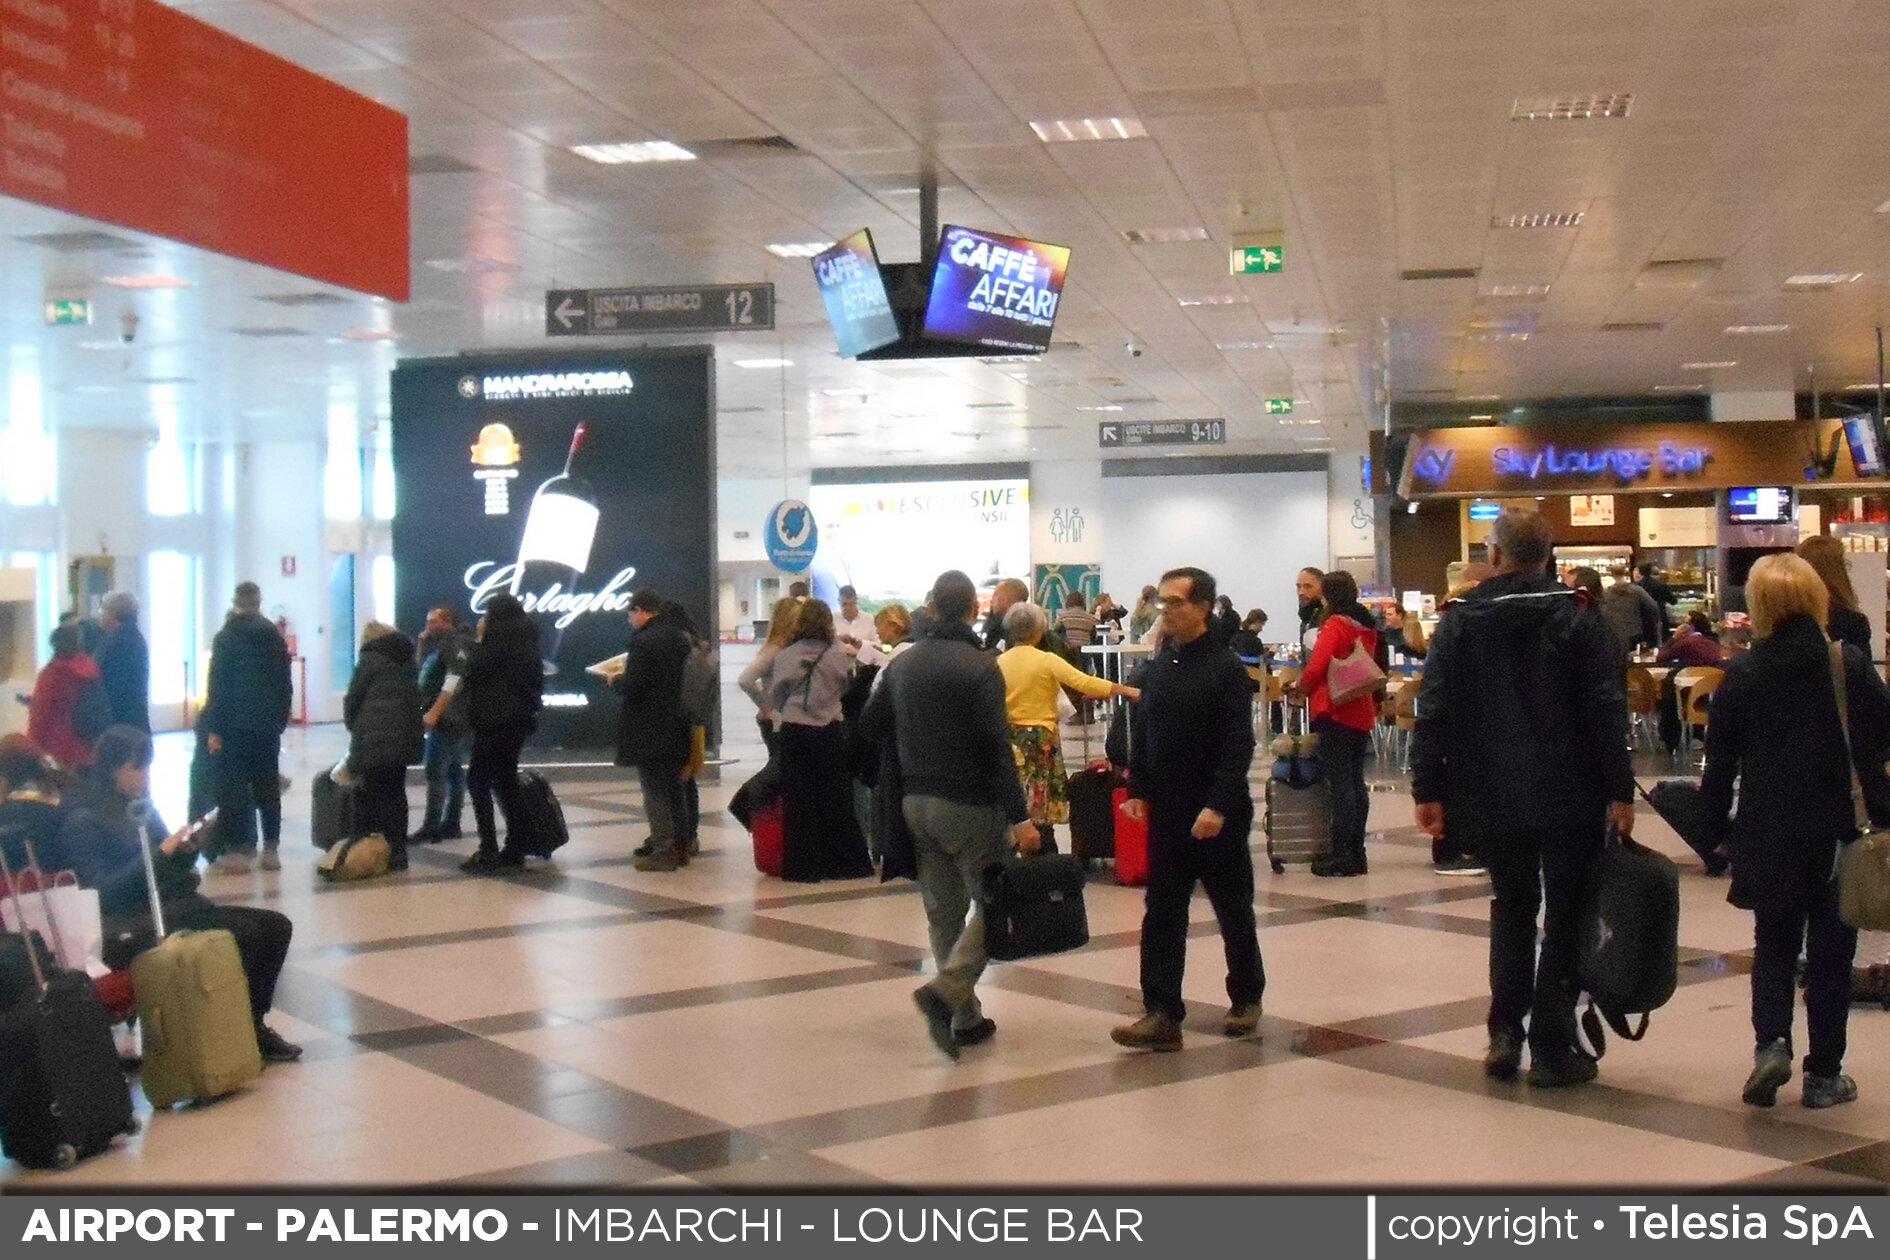 T_airportPalermo2.jpg